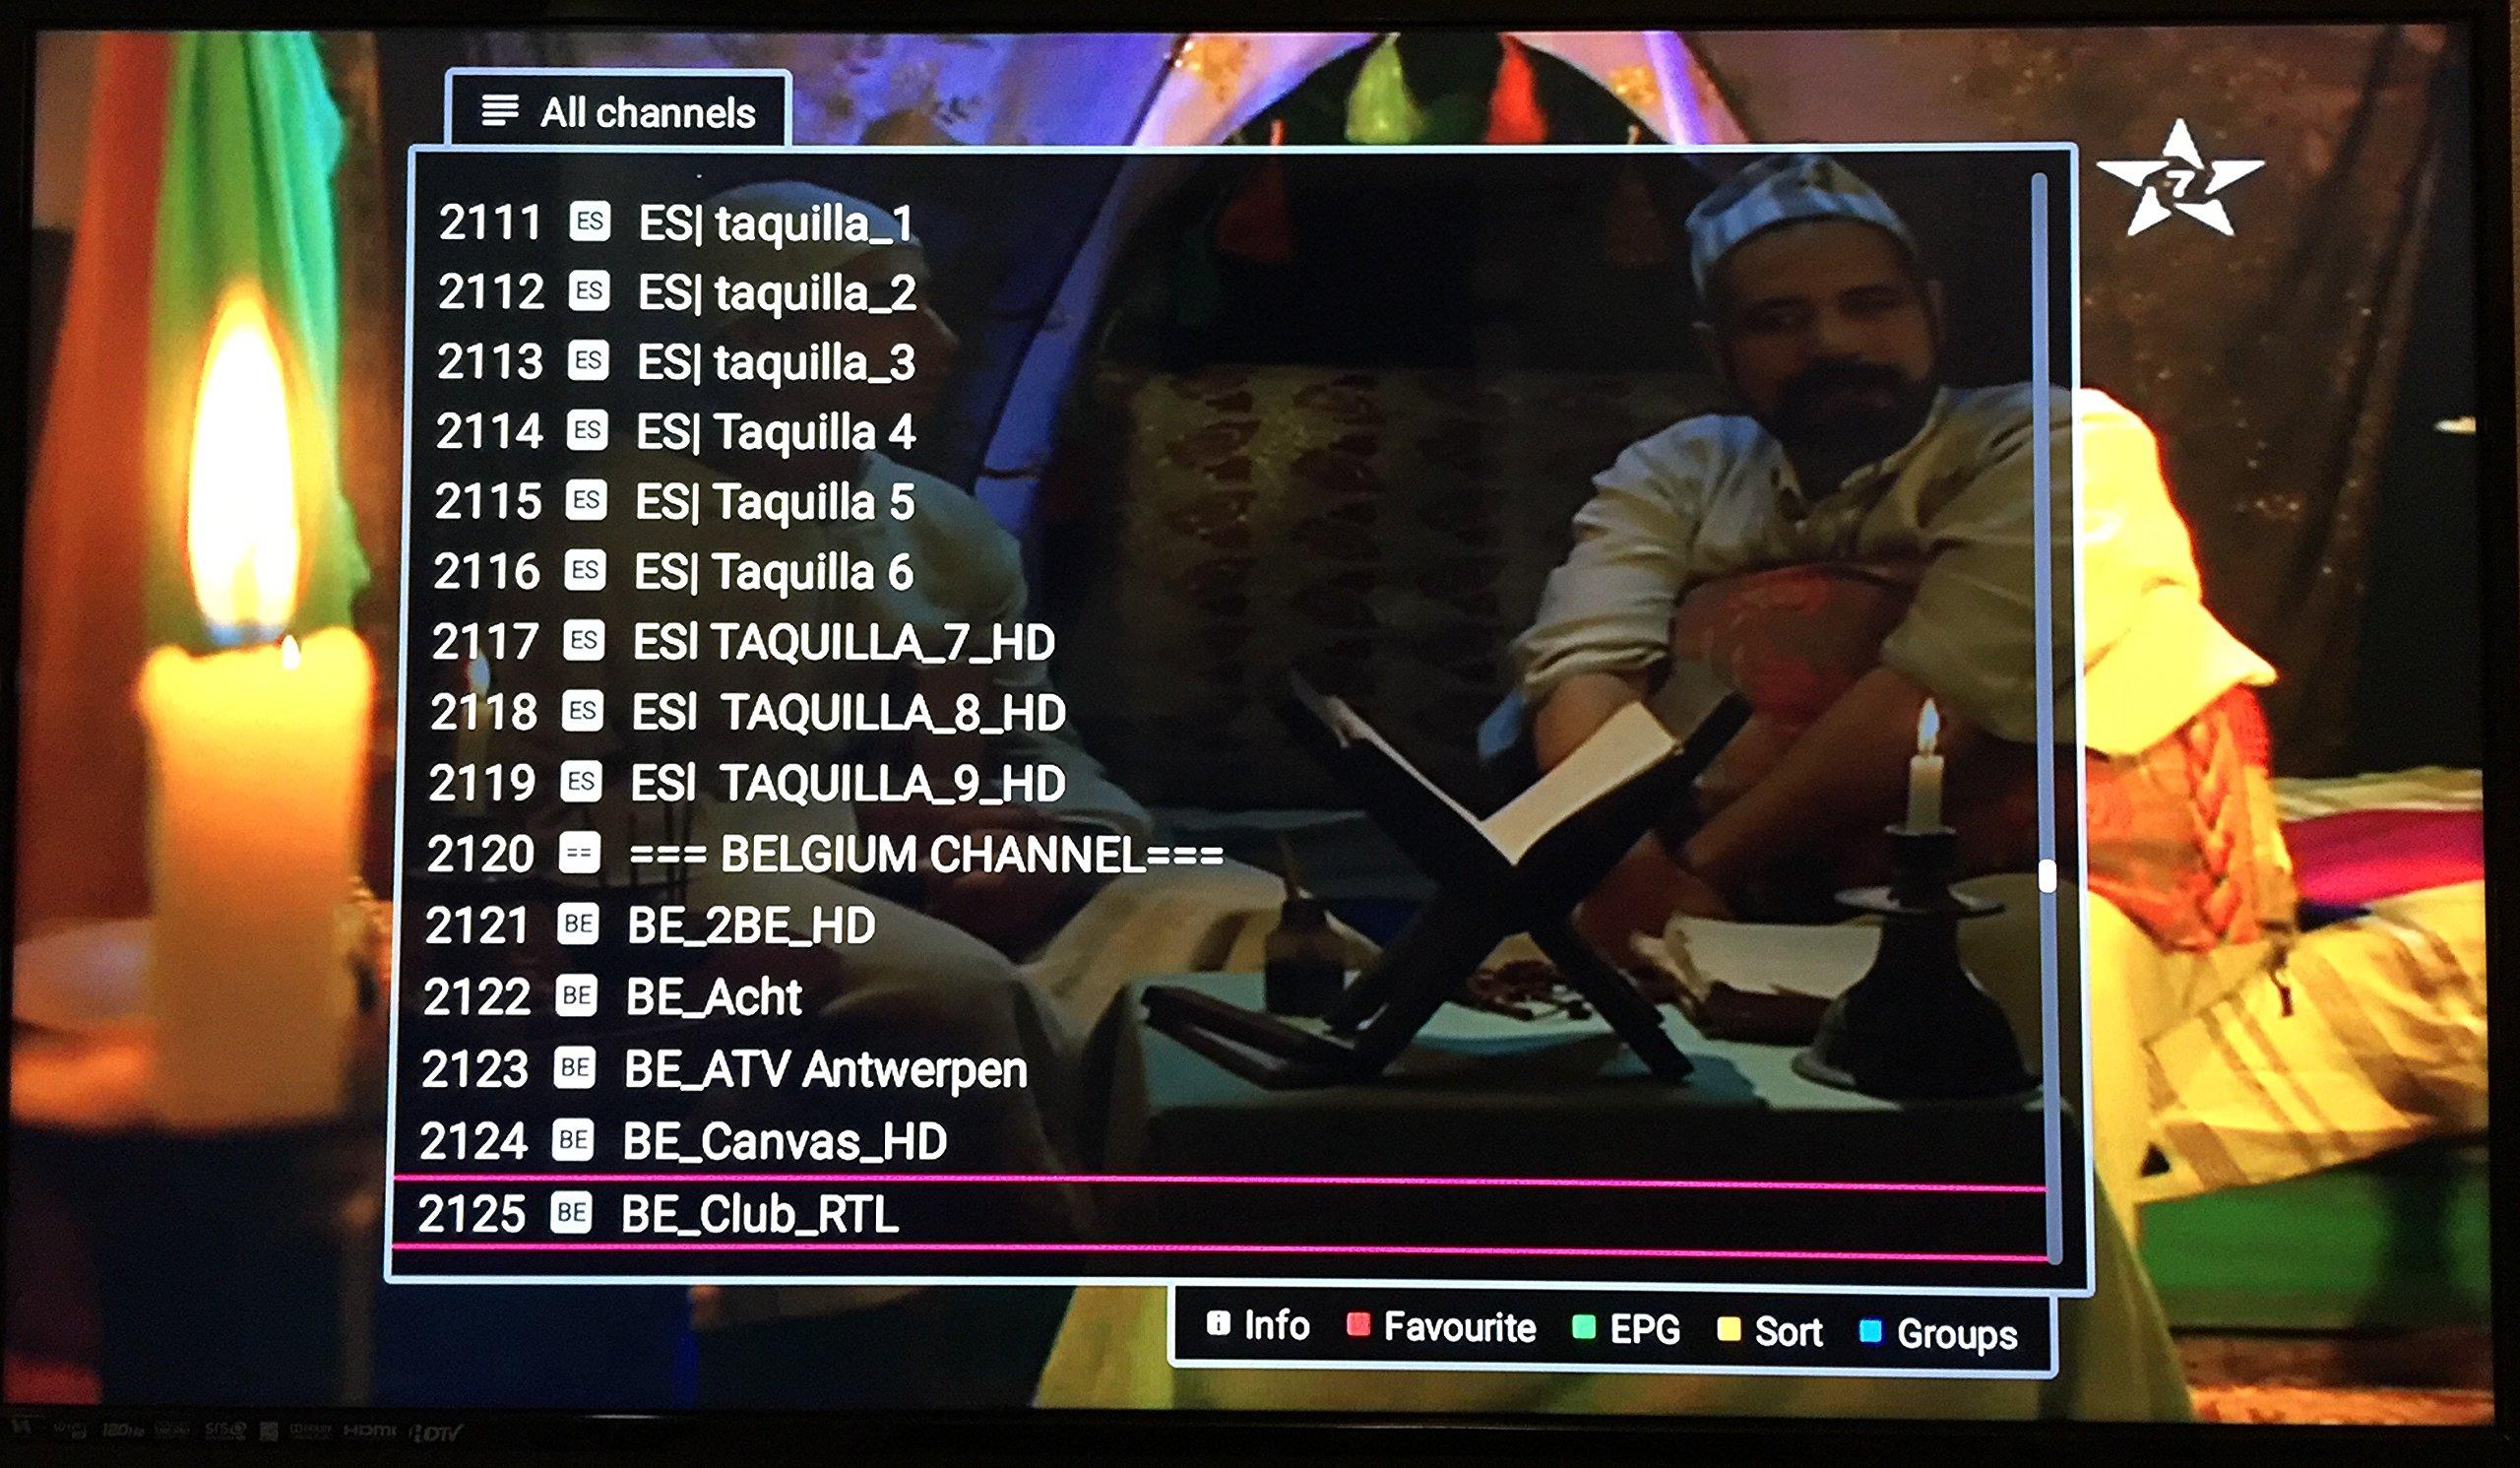 Arabia TV Super HD Receiver with 3000 Channel جهاز العائلة للقنواة العربية والعالمية (3000 Channel) by iptv+ (Image #5)